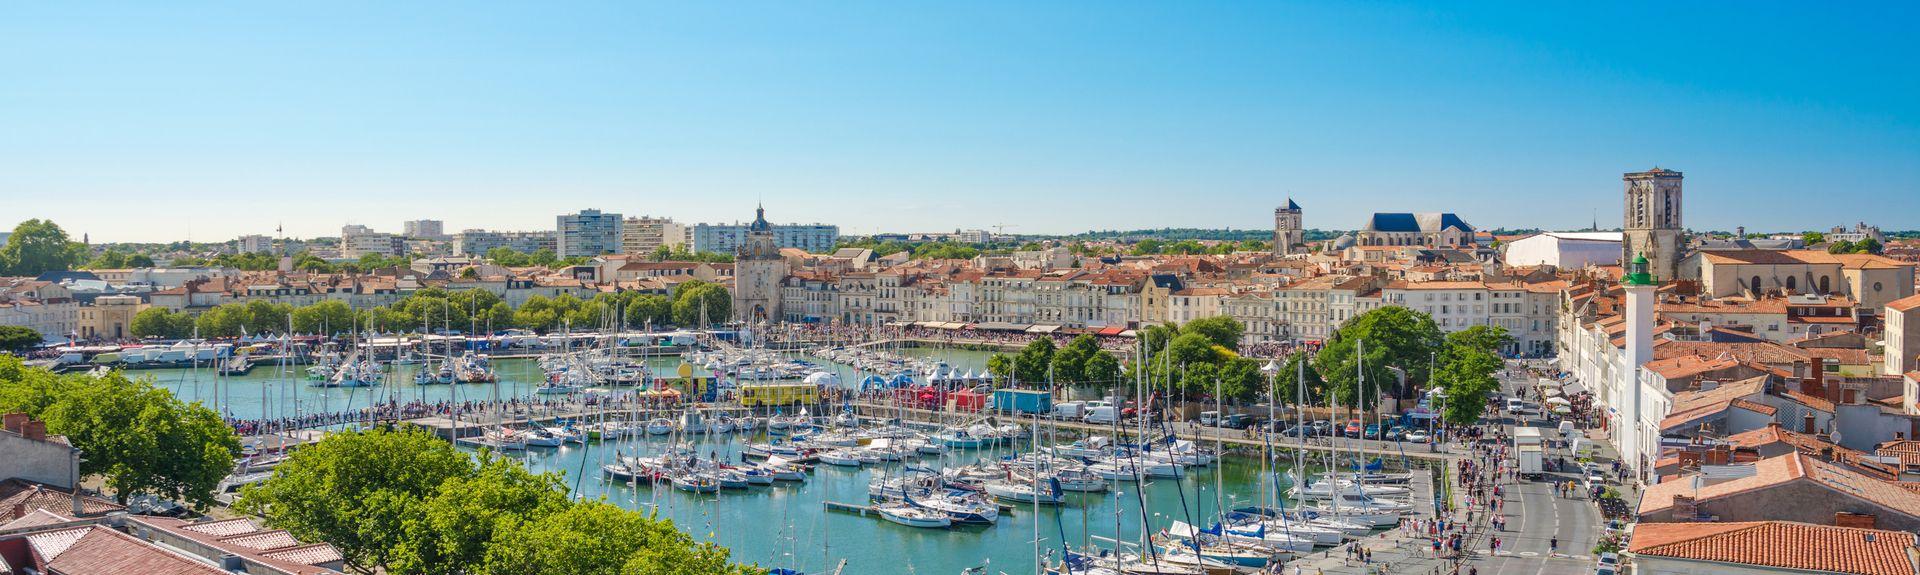 Charente-Maritime, Aquitaine-Limousin-Poitou-Charentes, Ranska